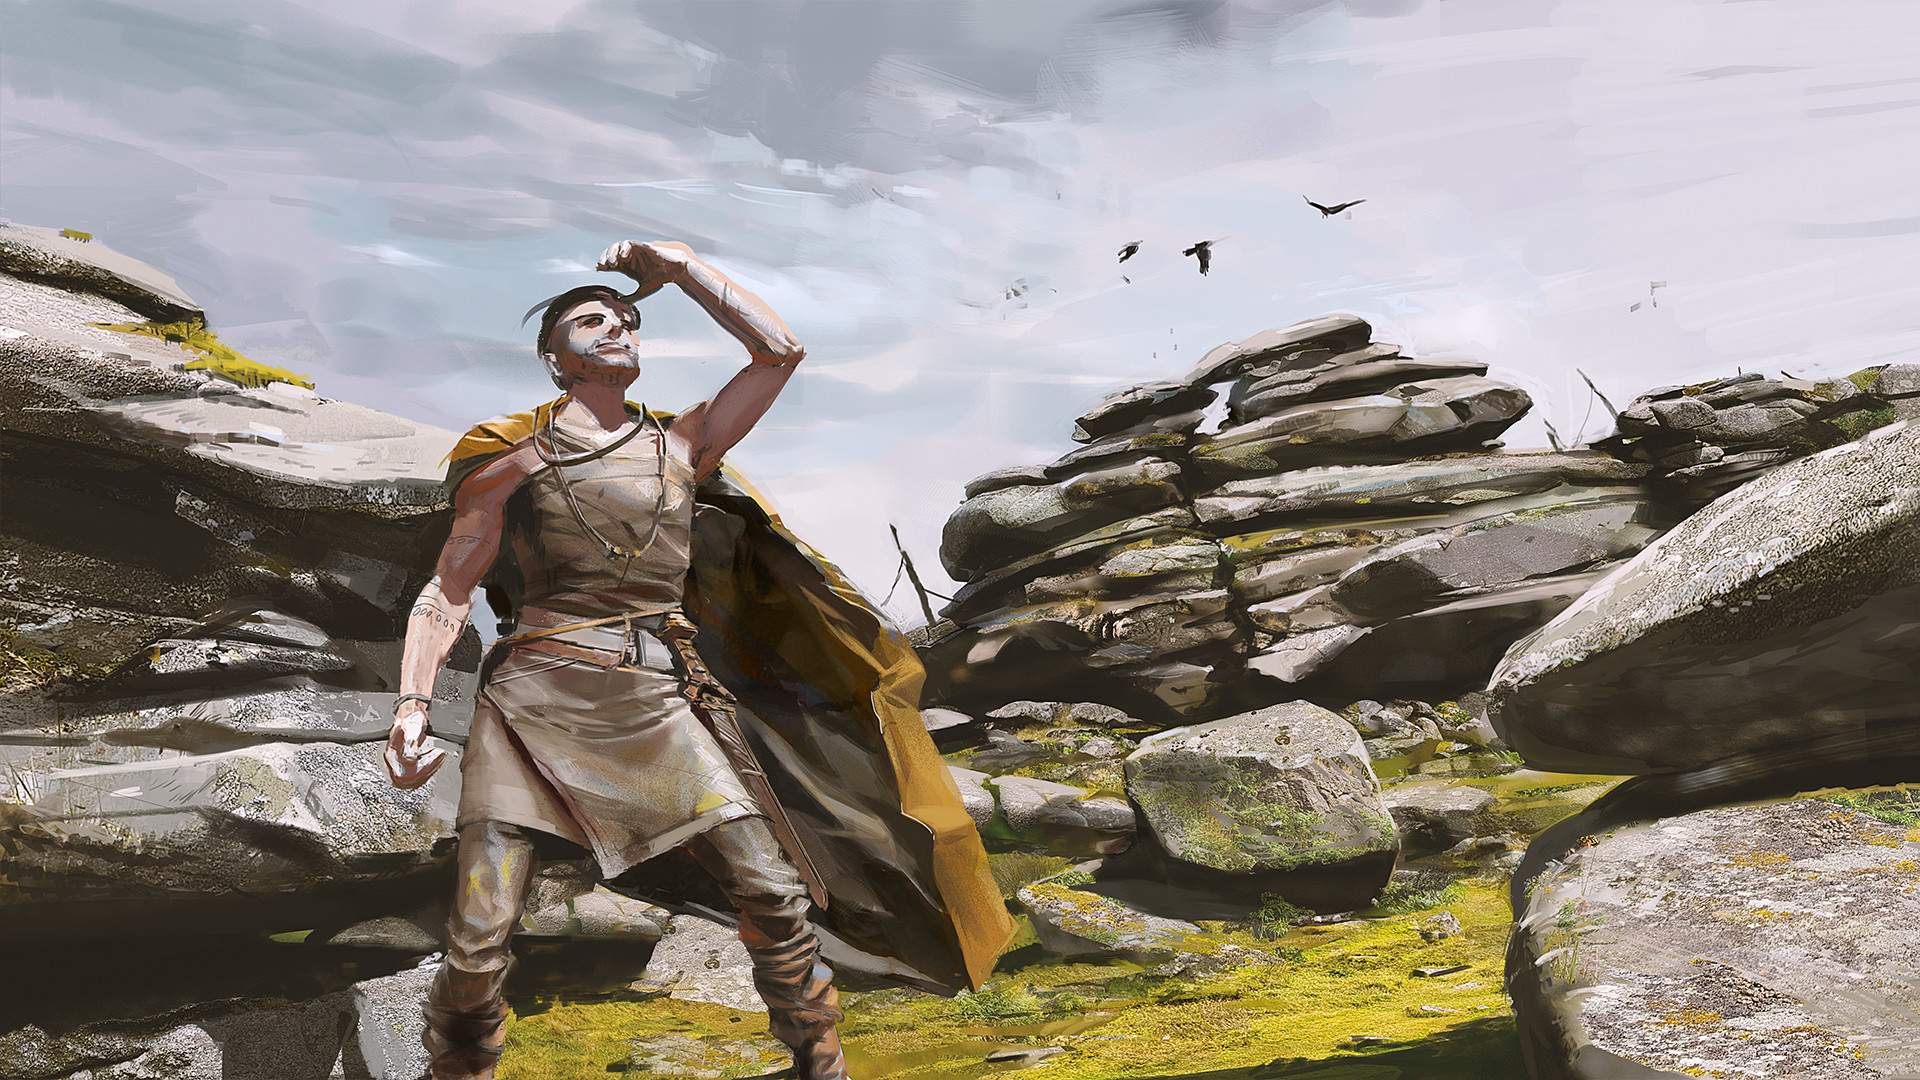 Phoebe herring neolithicman2